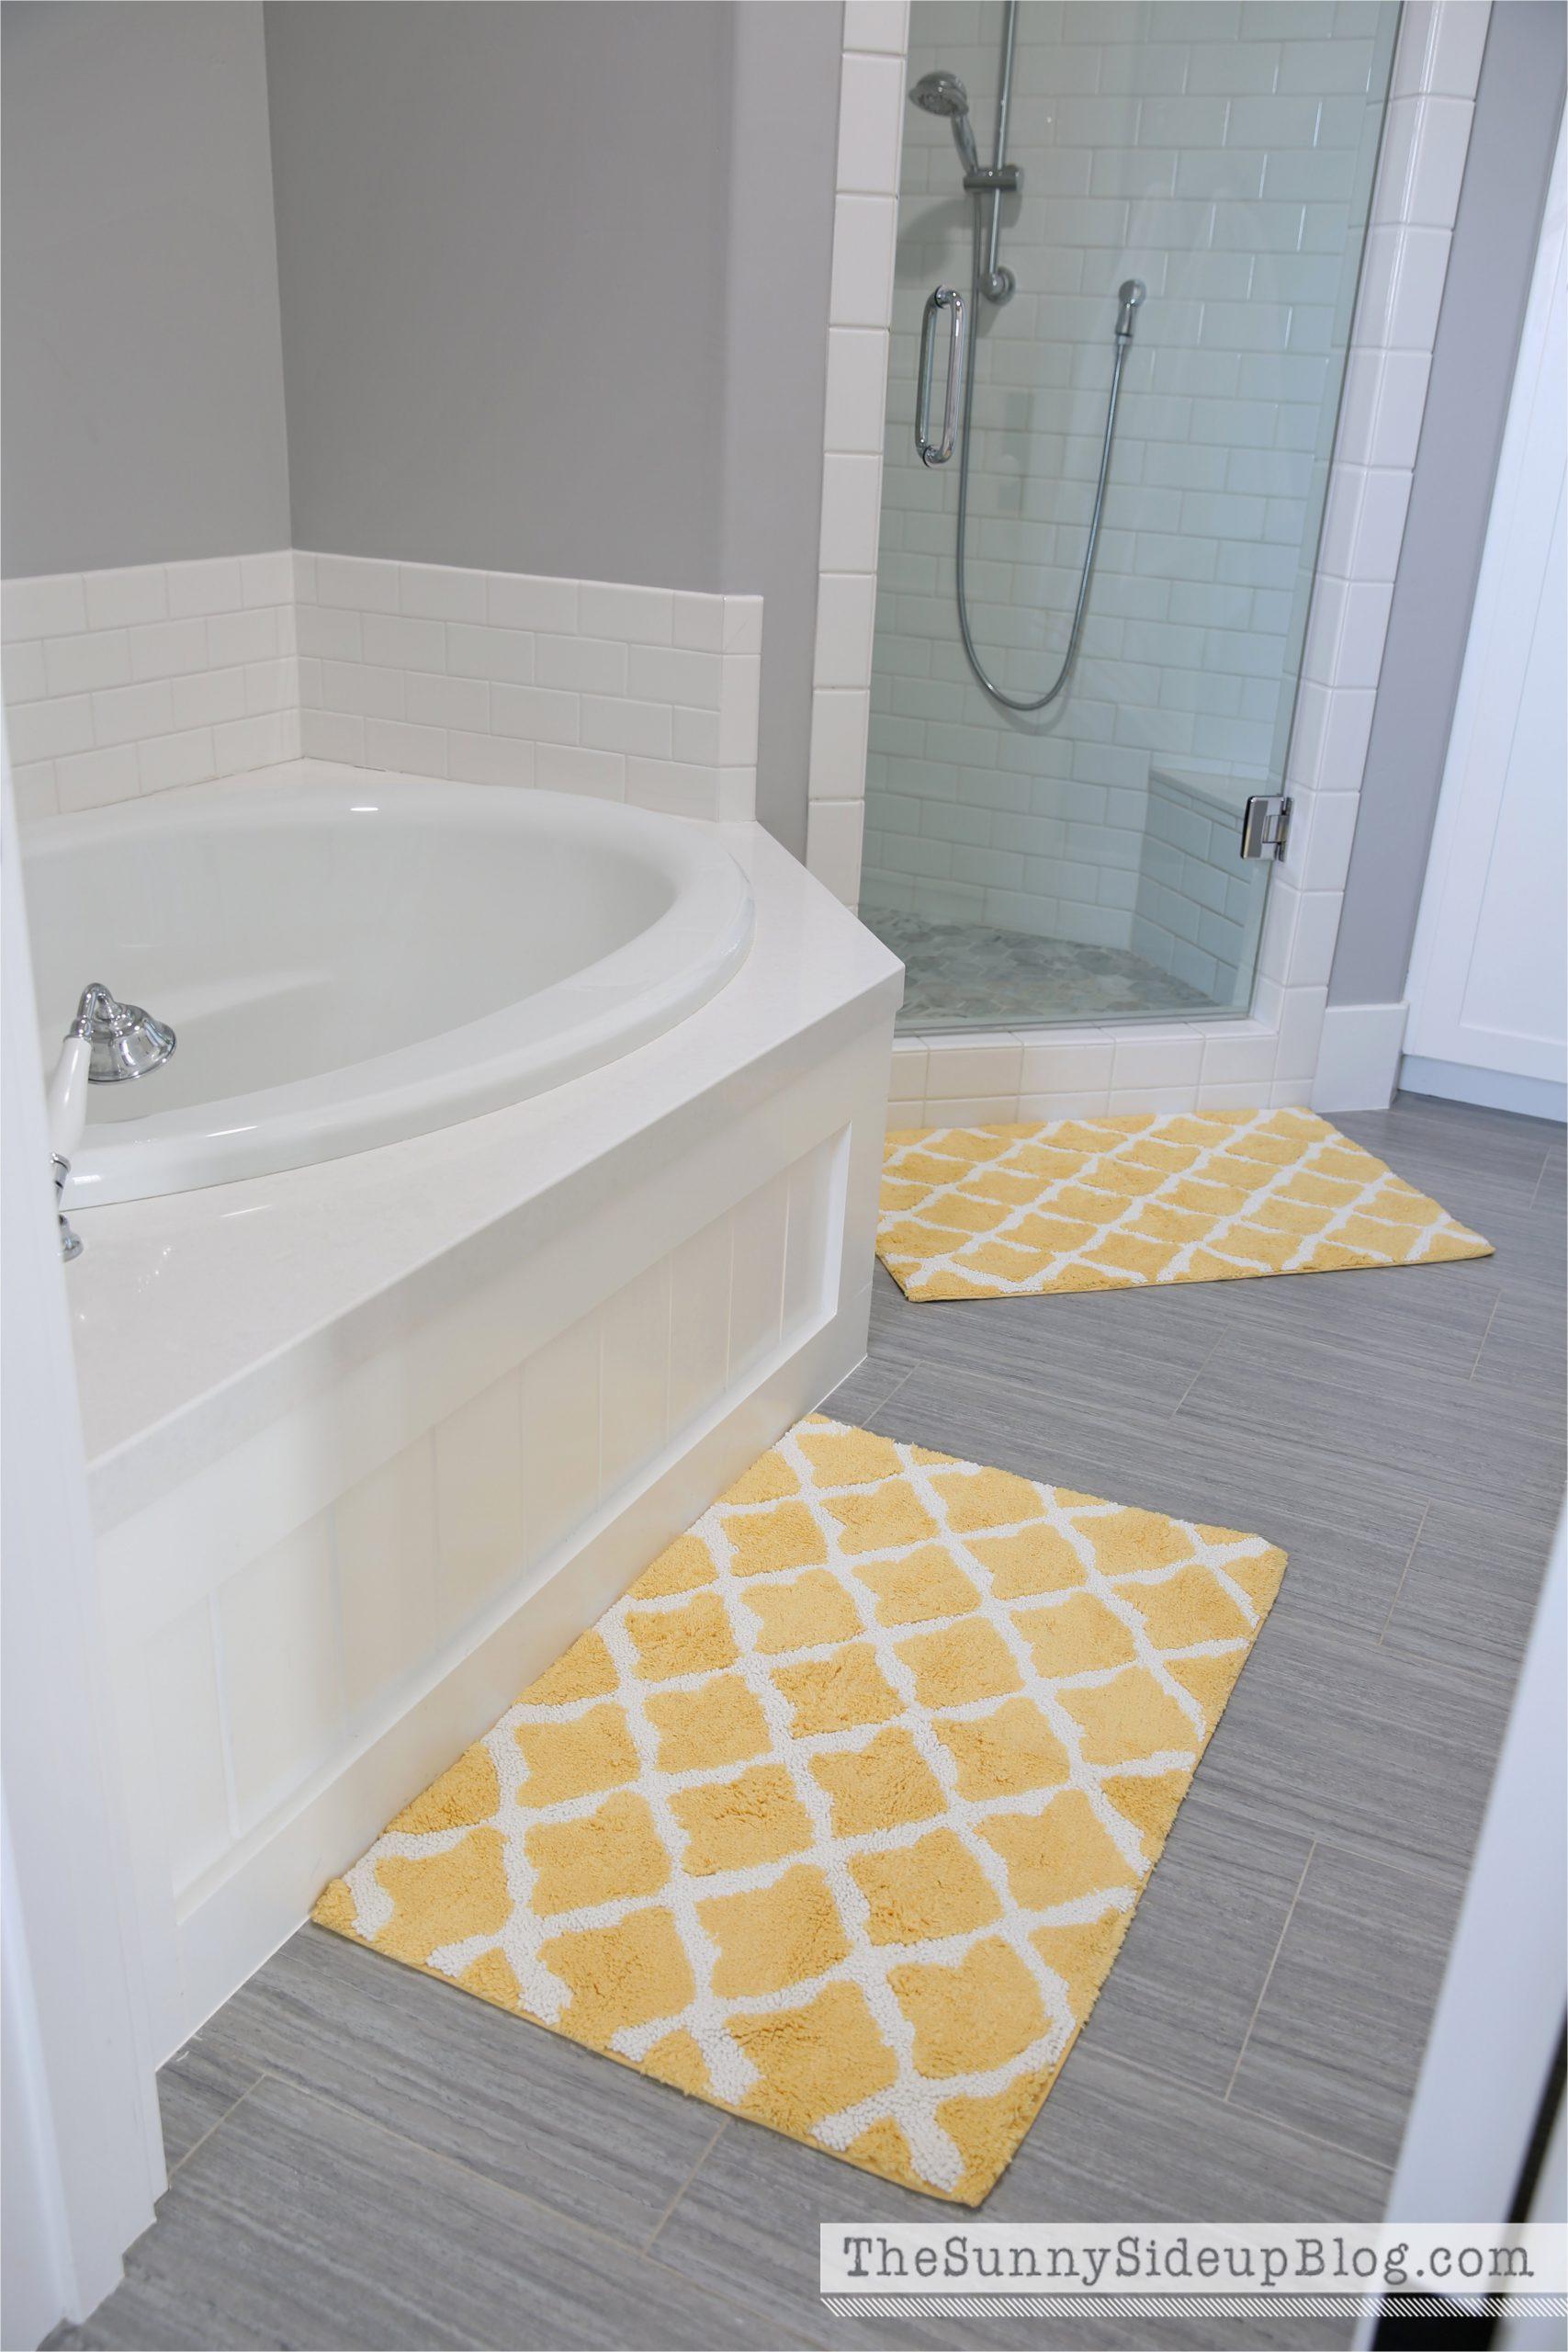 Gray Bathroom Rugs Target Bathroom Rugs Tar Image Of Bathroom and Closet